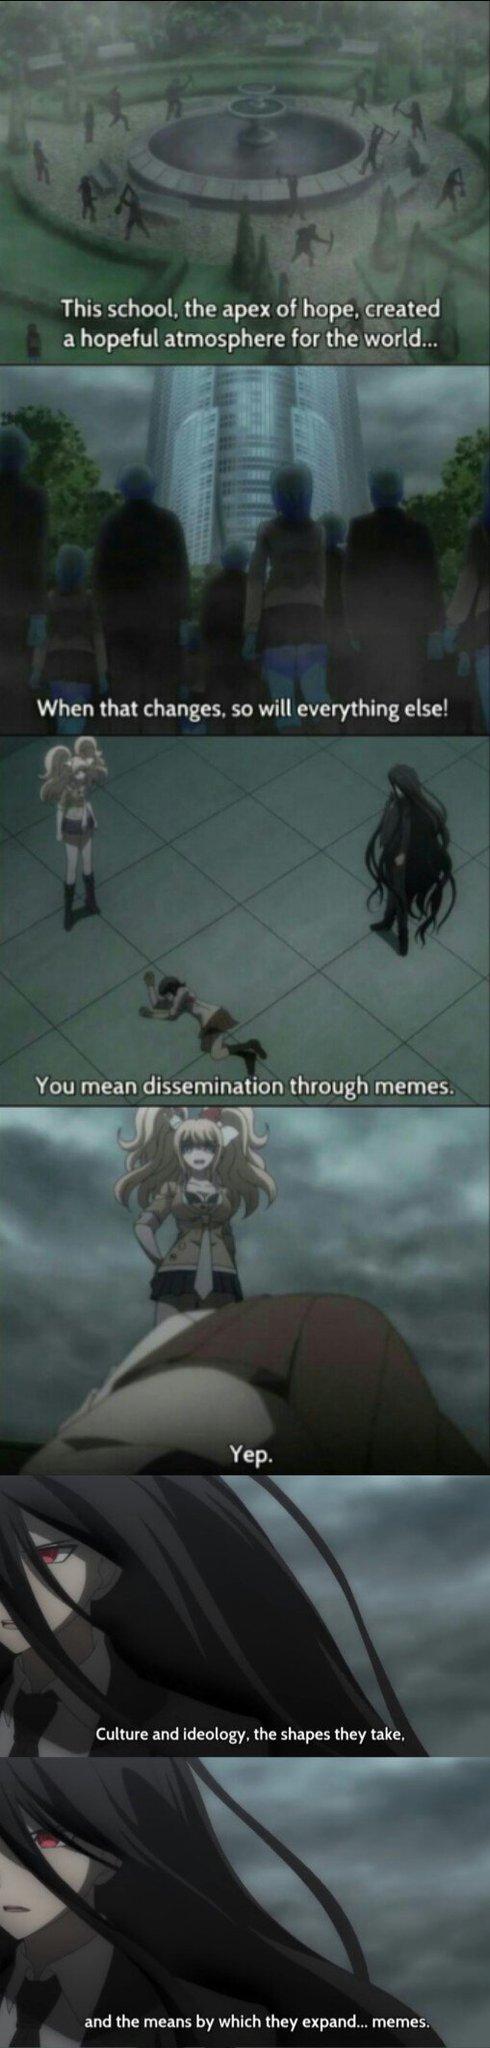 memes are evil ?!? :<